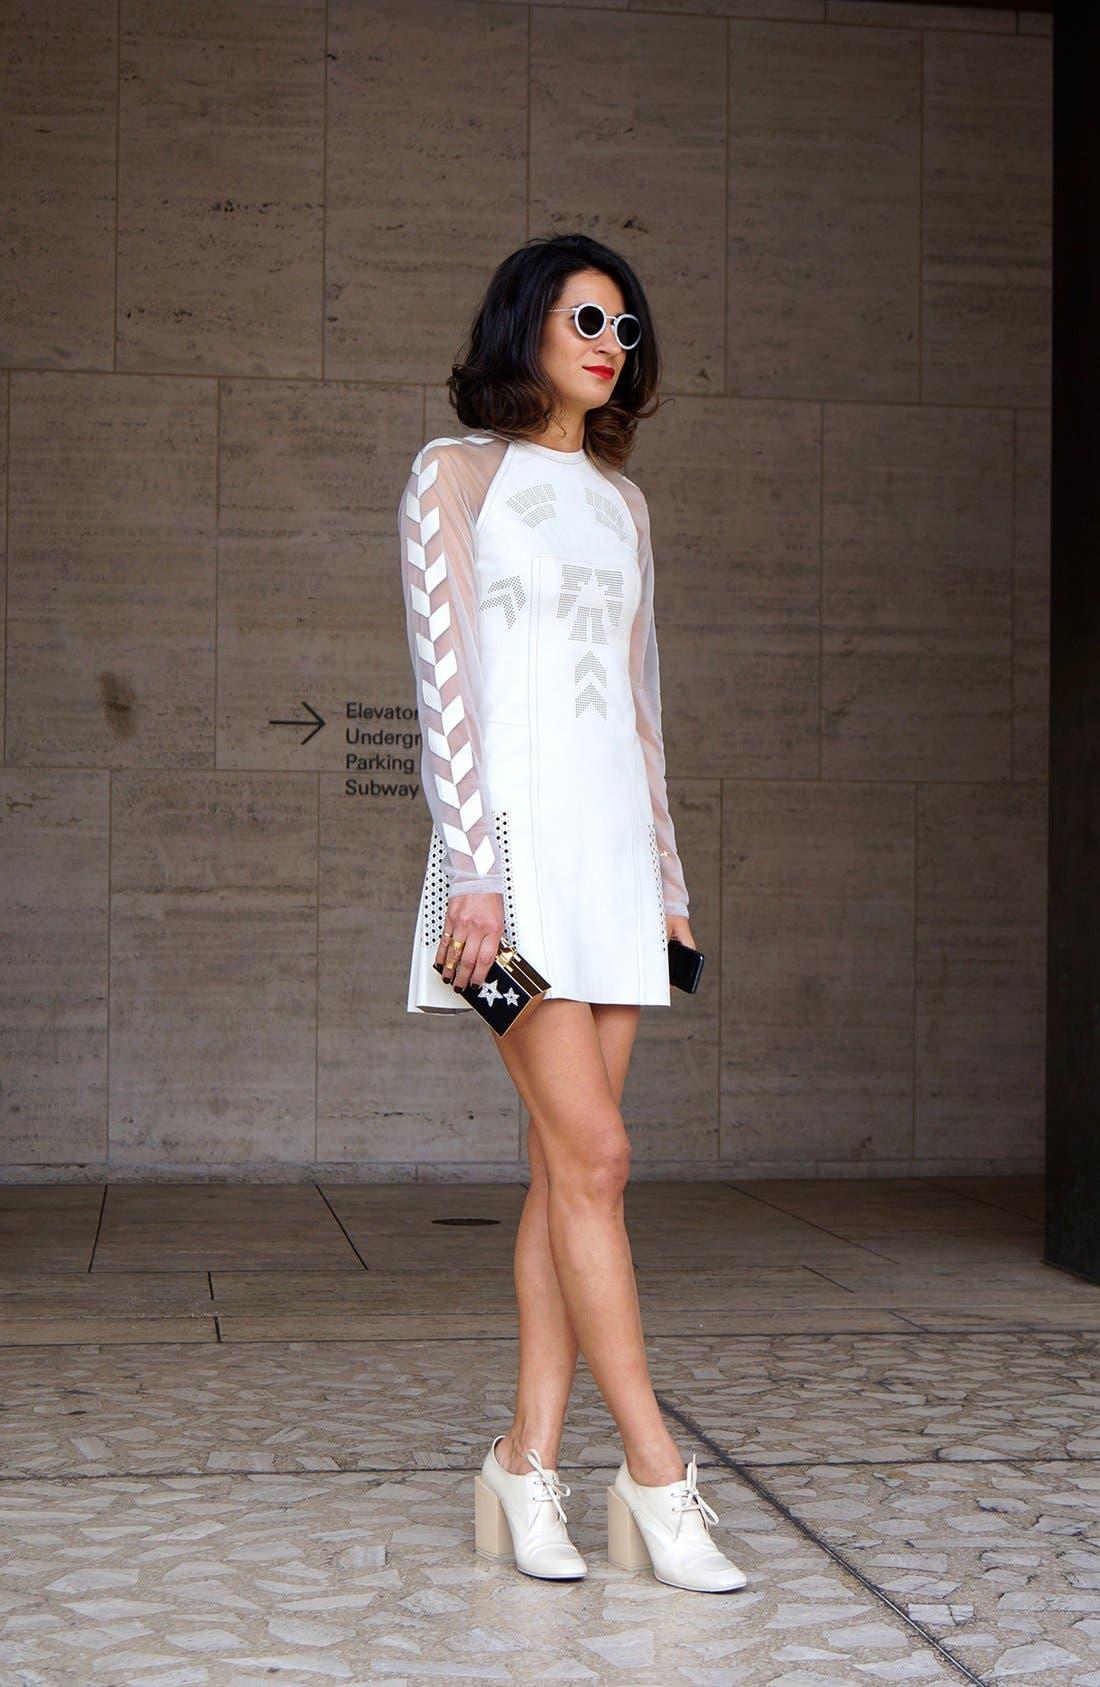 Alternate Image 1 Selected - Peekaboo Dress Street Style Look